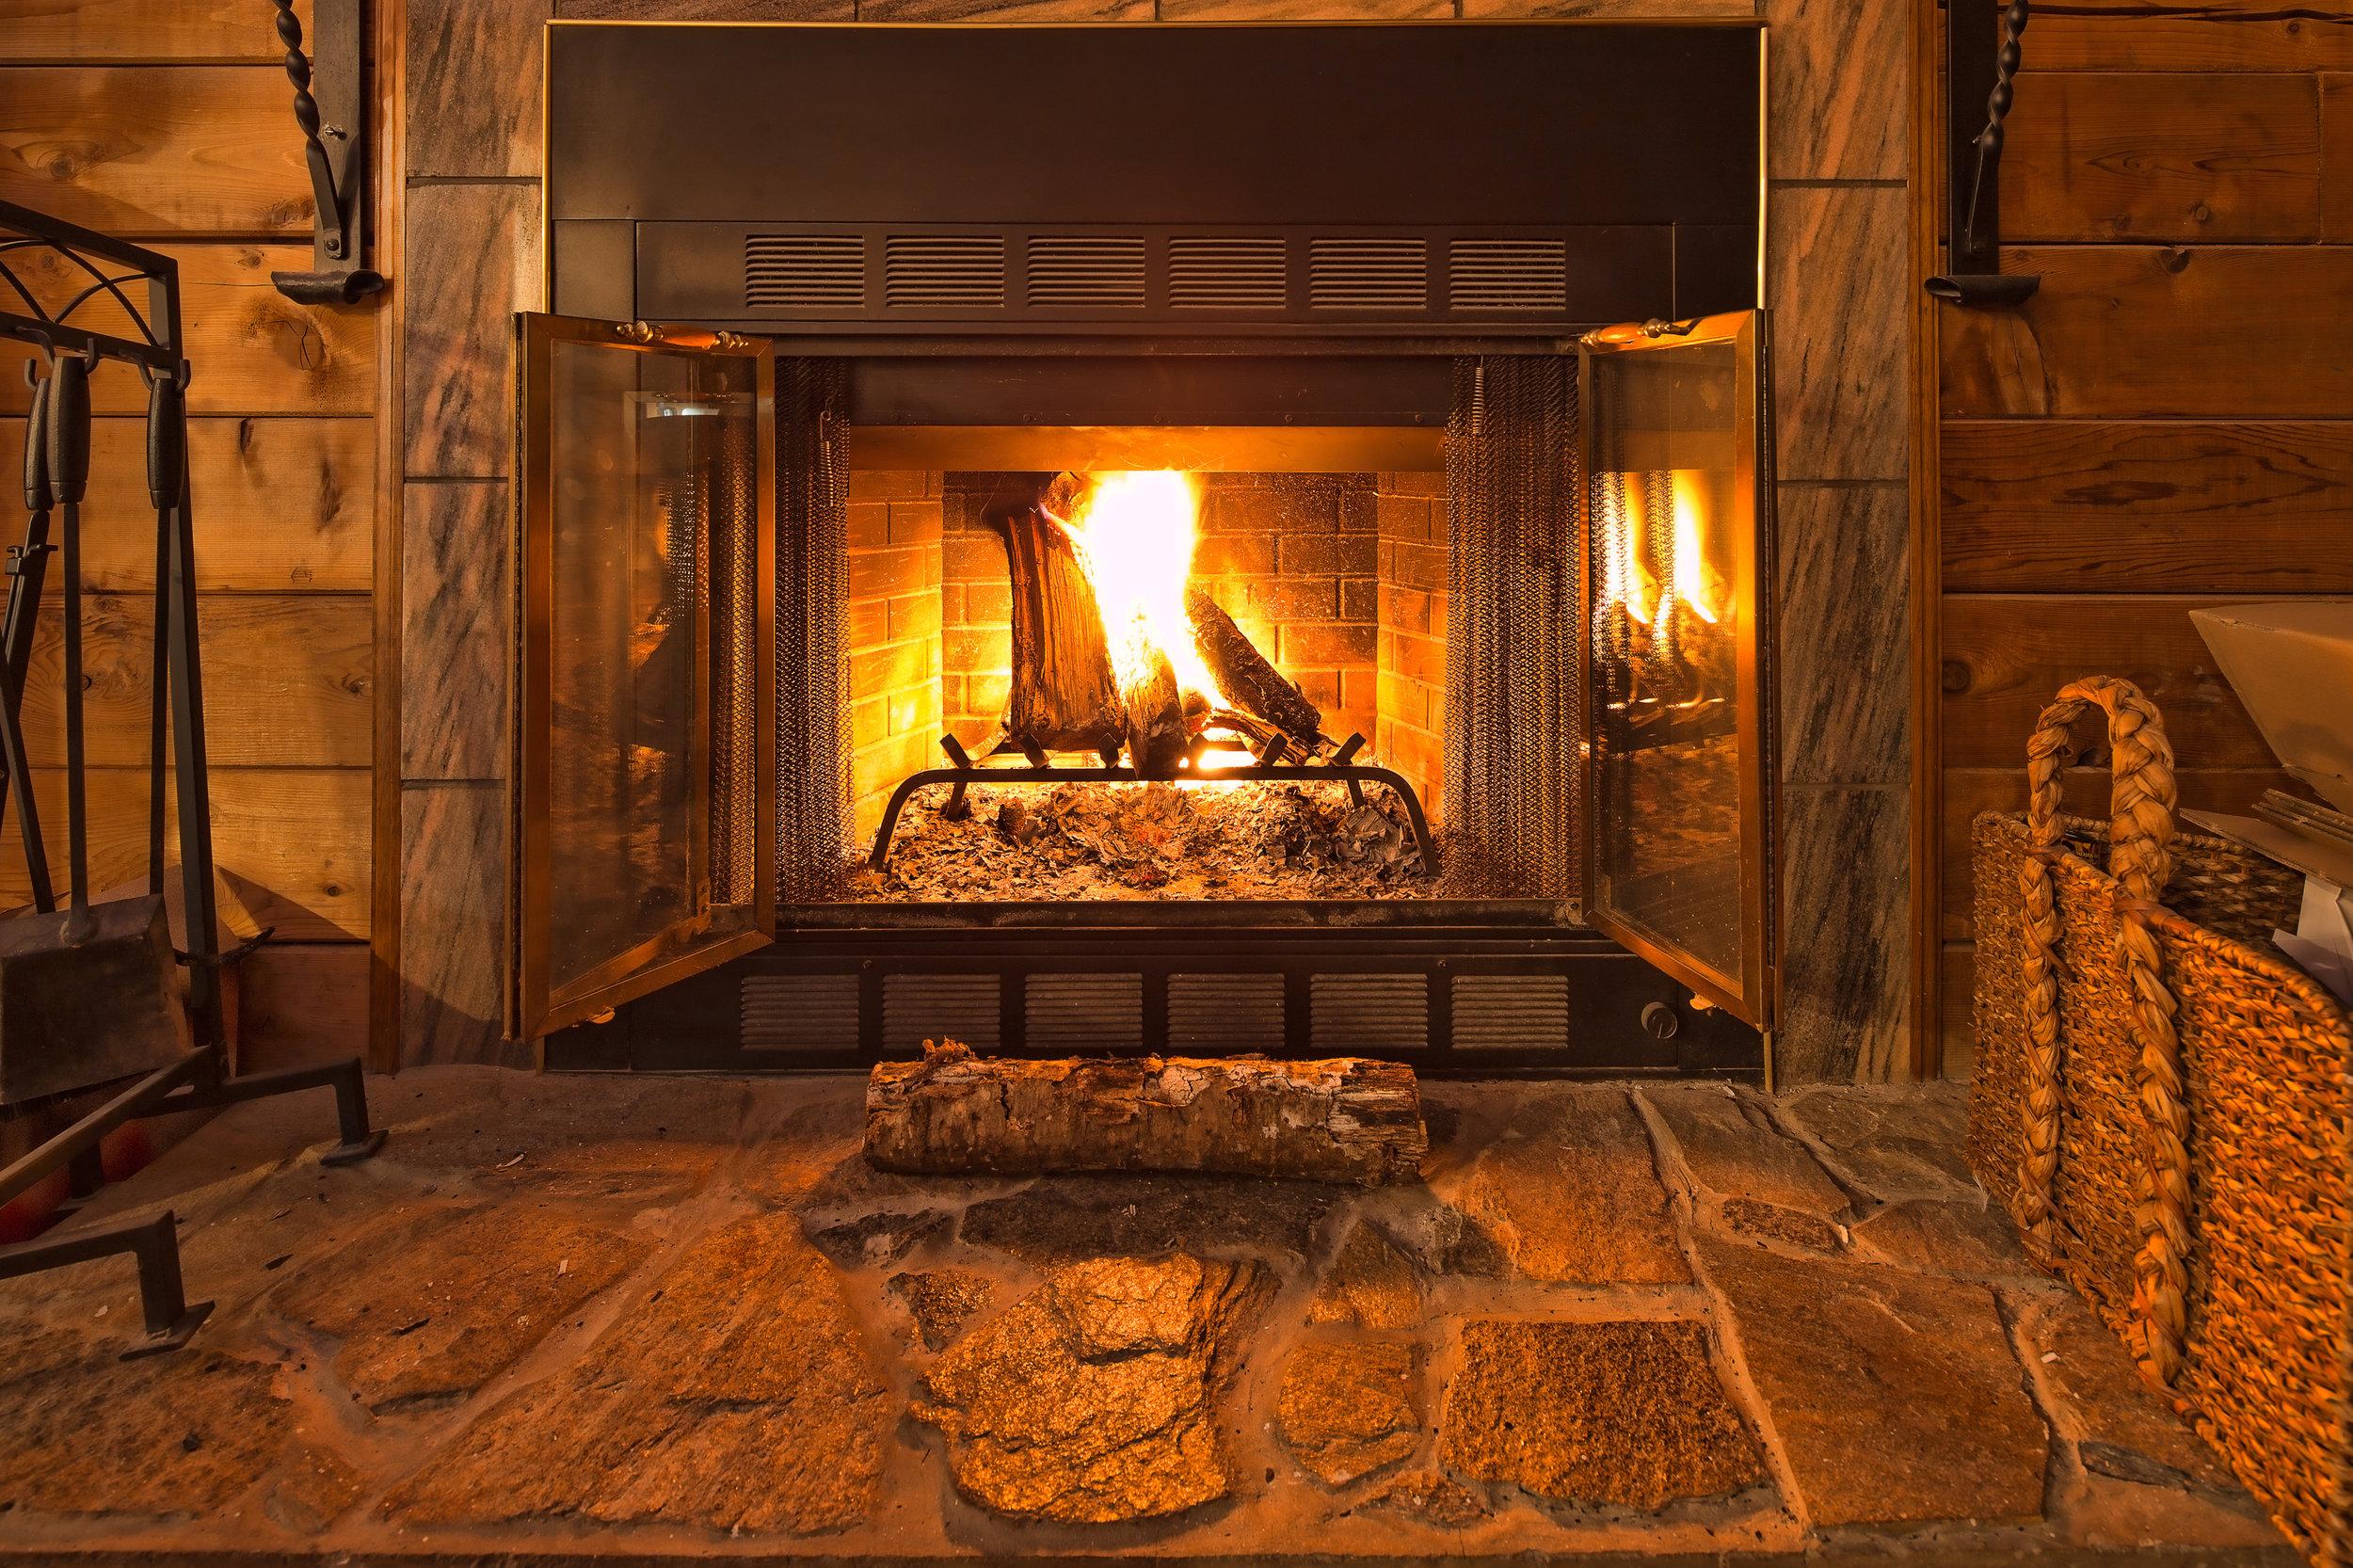 Warm-Fireplace-474076023_3867x2578.jpeg